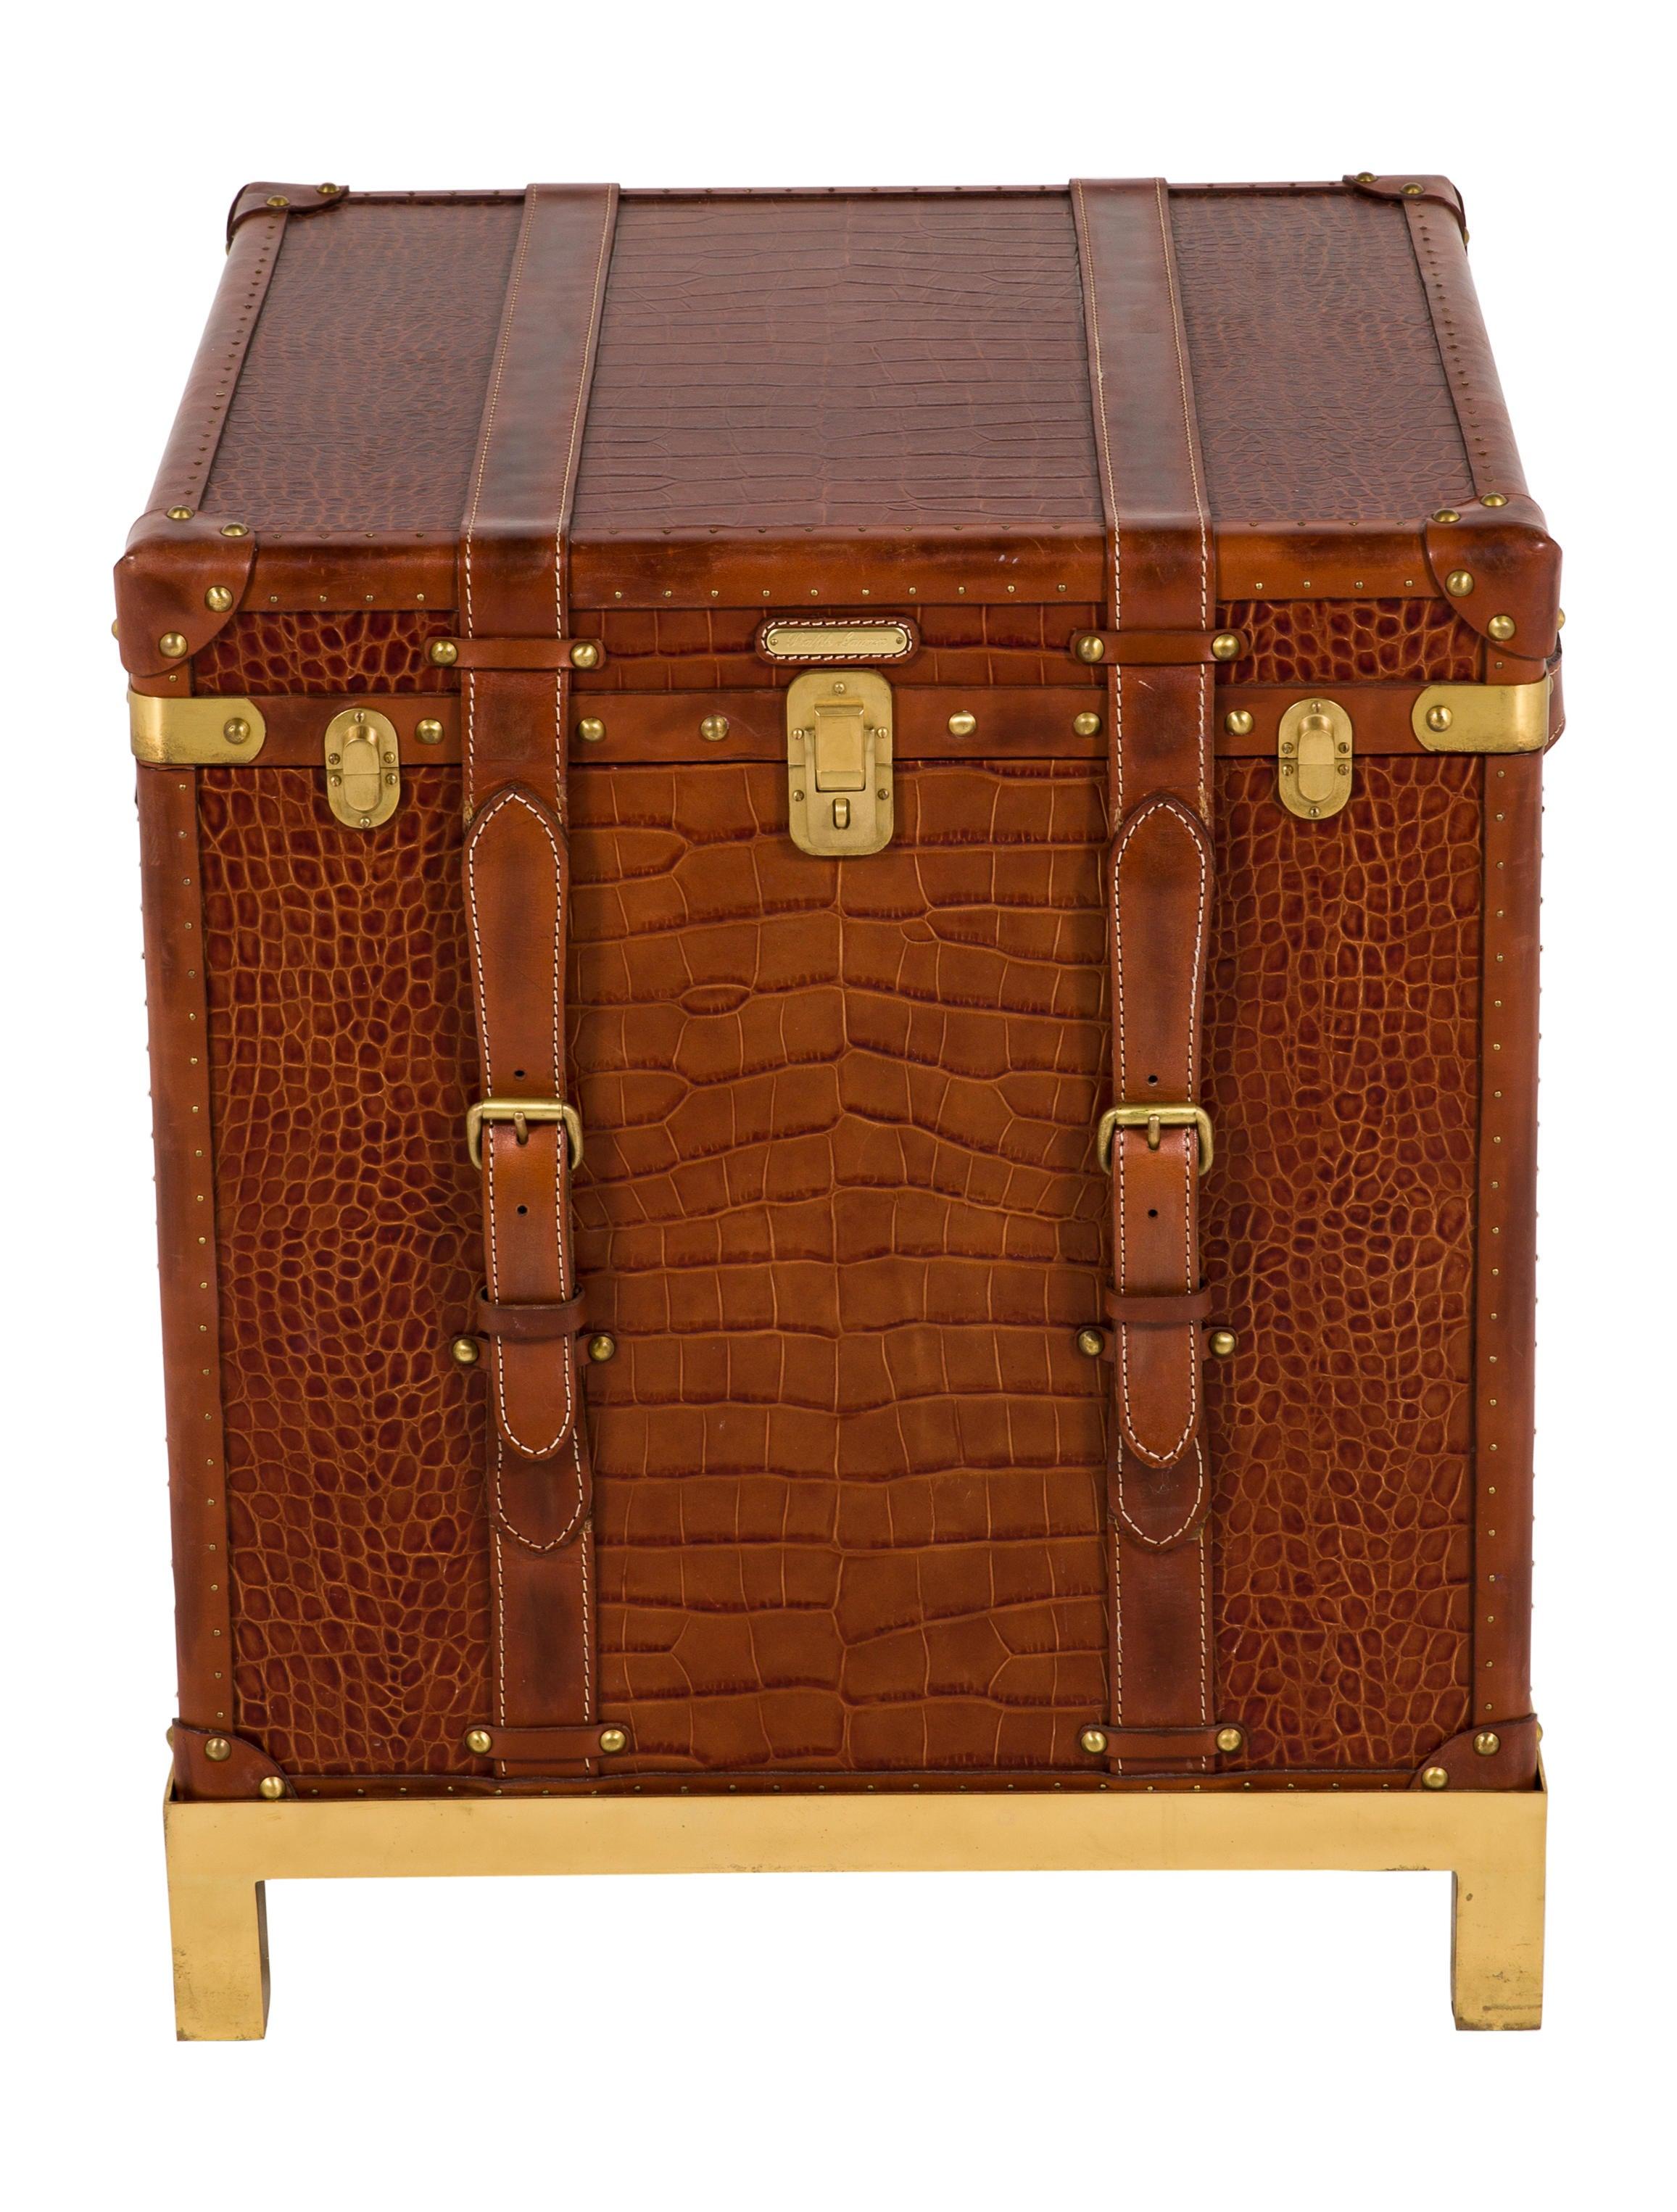 Ralph lauren safari end table furniture wyg22860 the for Ralph lauren outdoor furniture